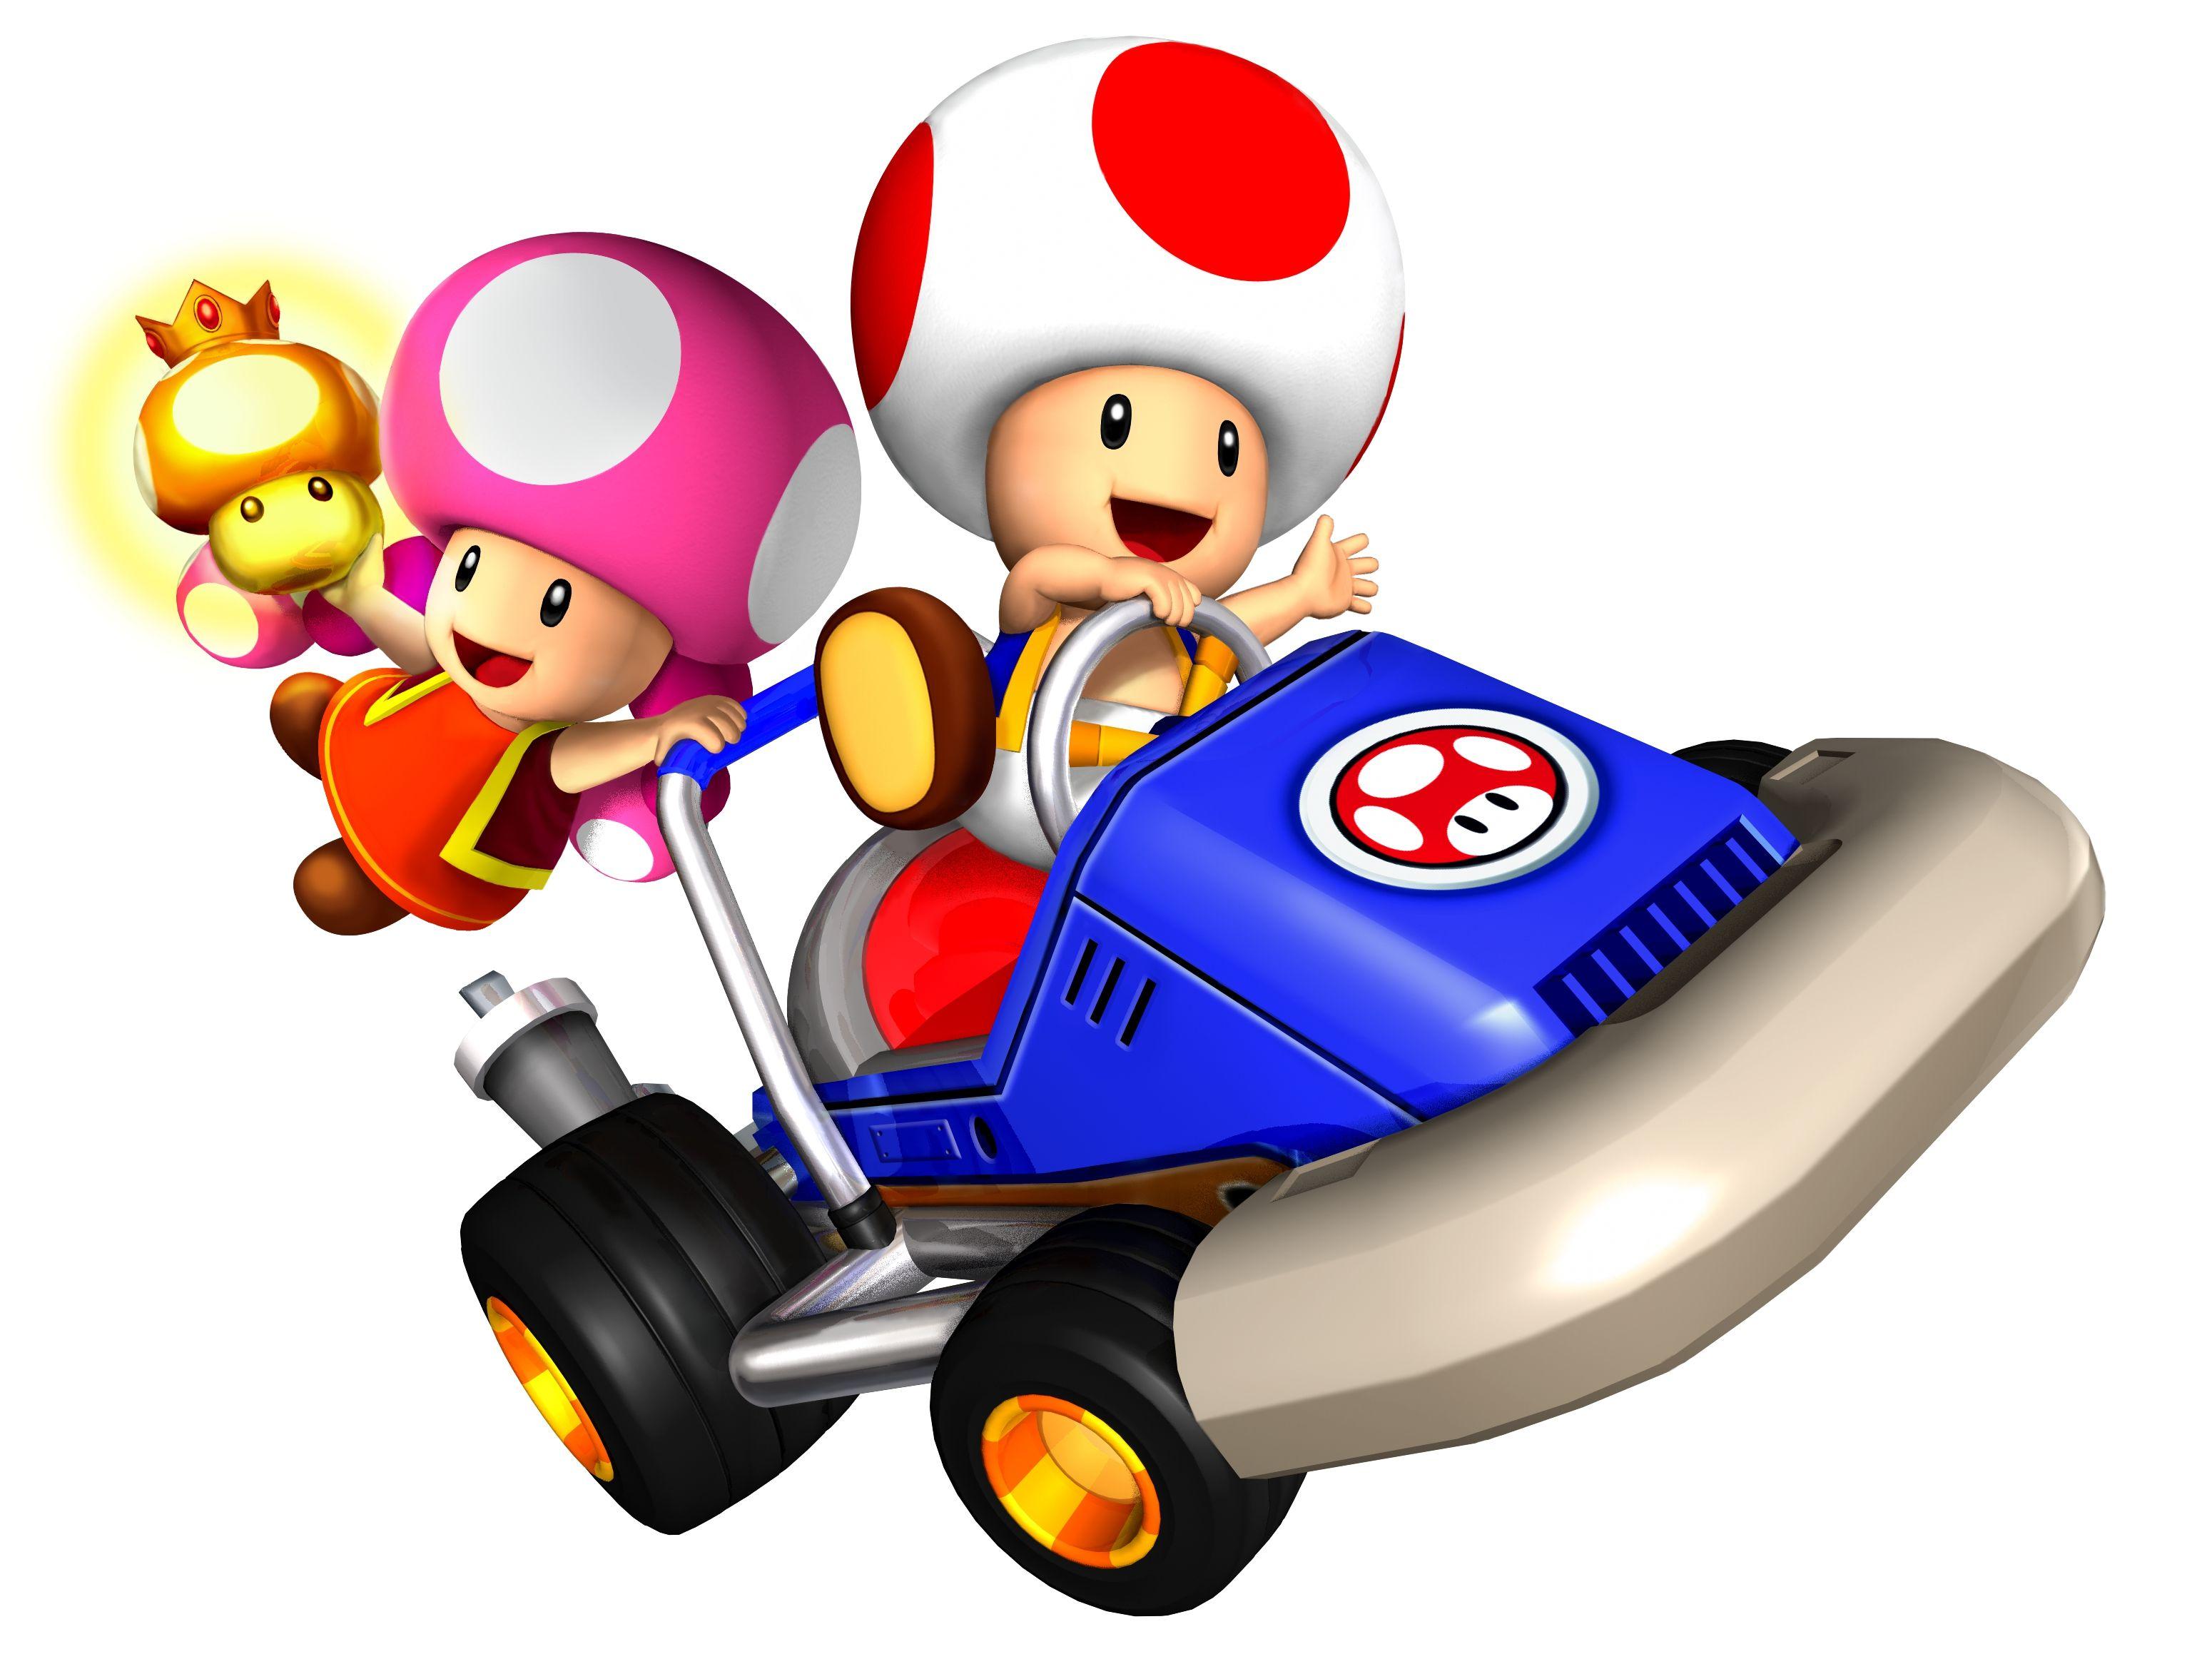 Toad & Toadette in mario kart 2 dash